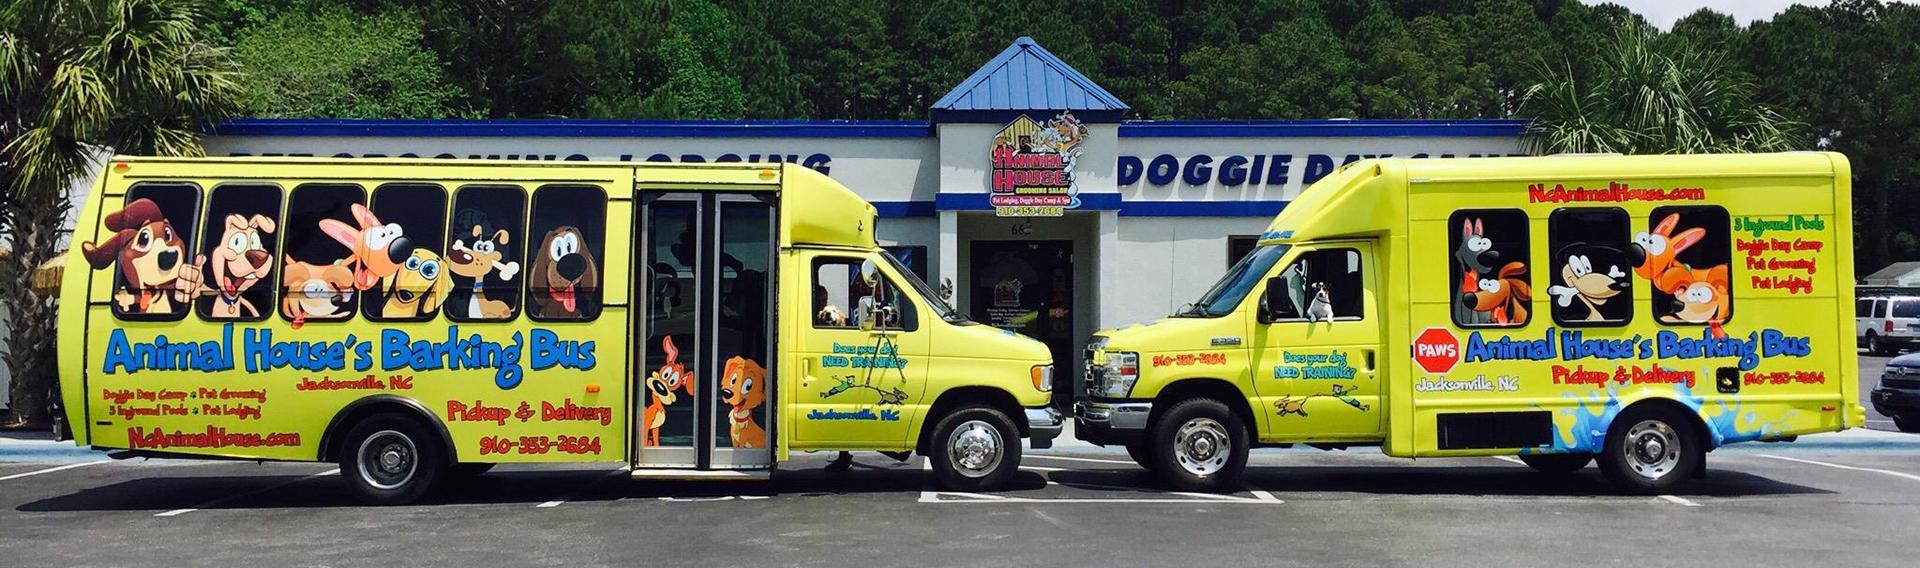 North Carolina's Top Rated Local® Pet Groomers Award Winner: Animal House Grooming